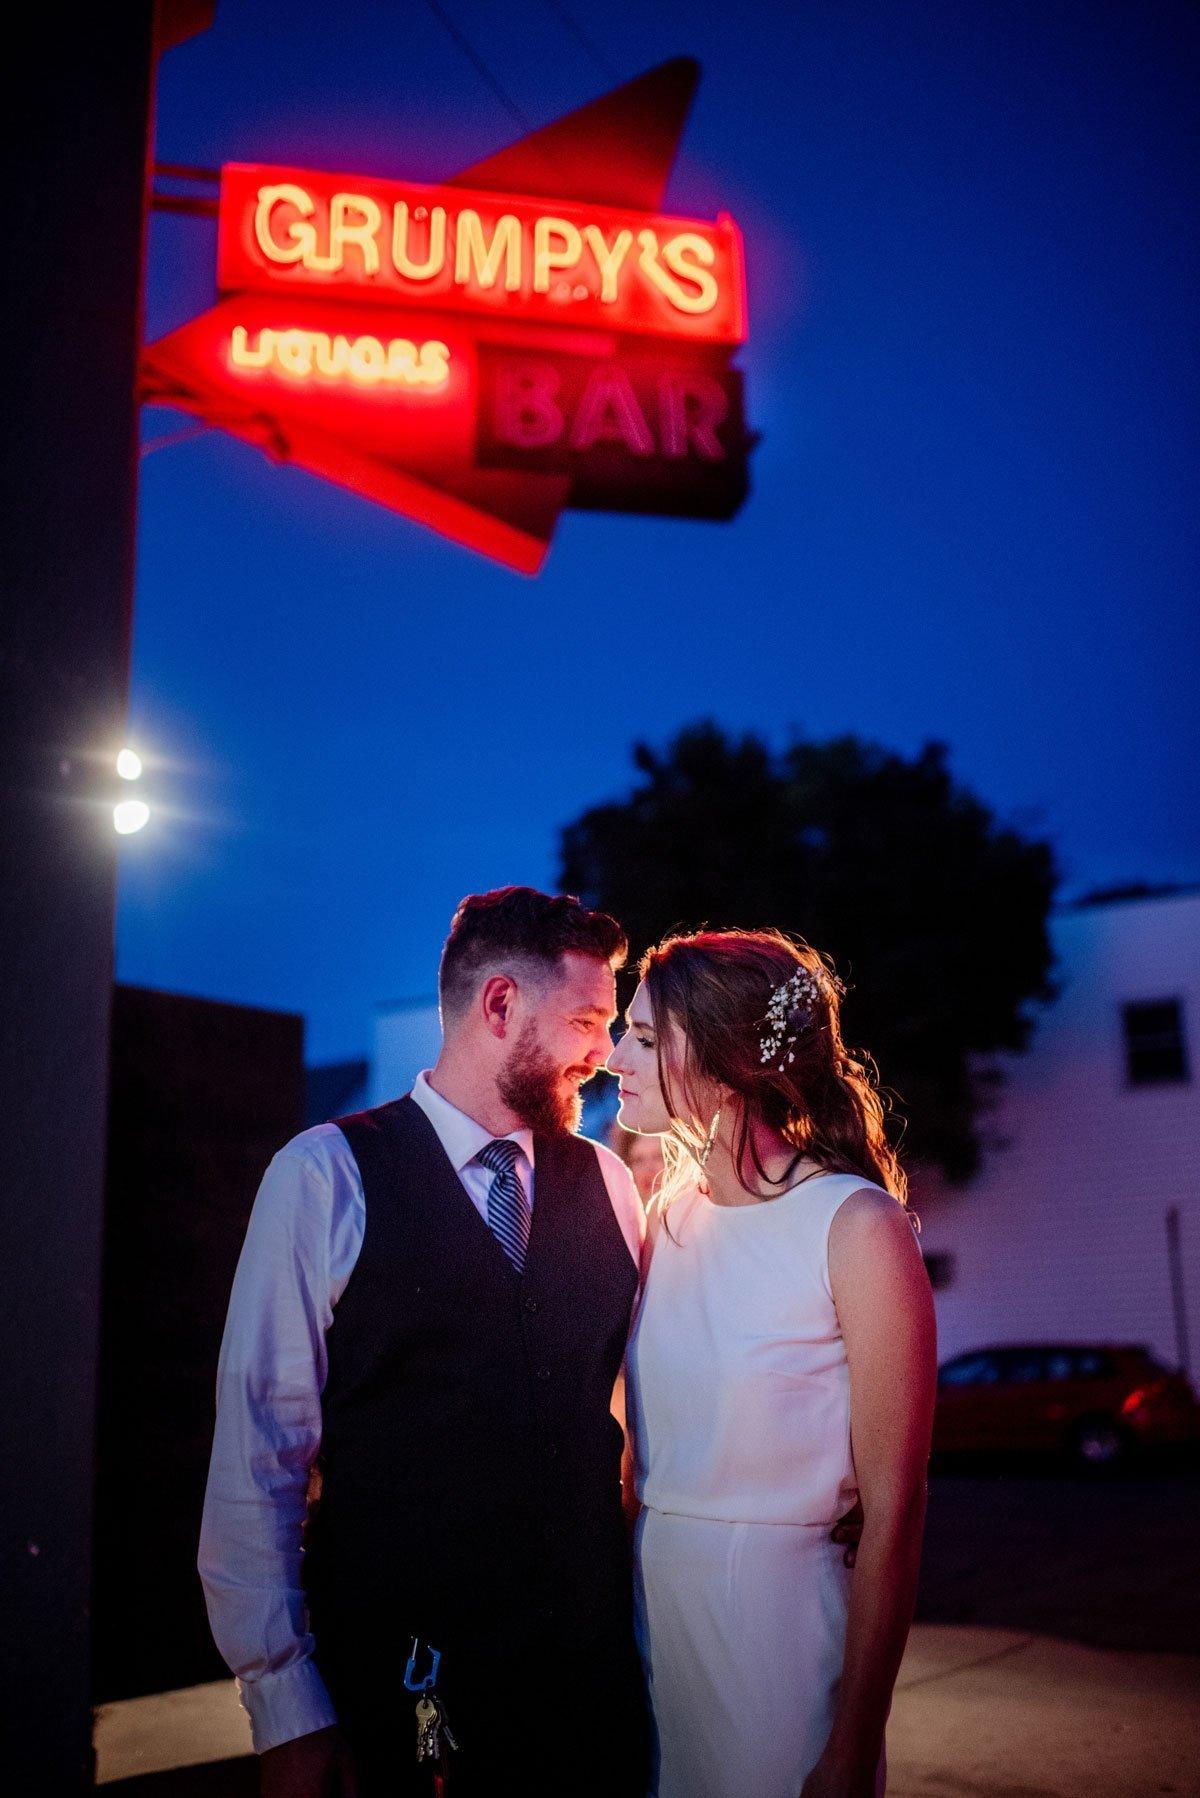 couple at night outside grumpys bar northeast minneapolis dive bar wedding